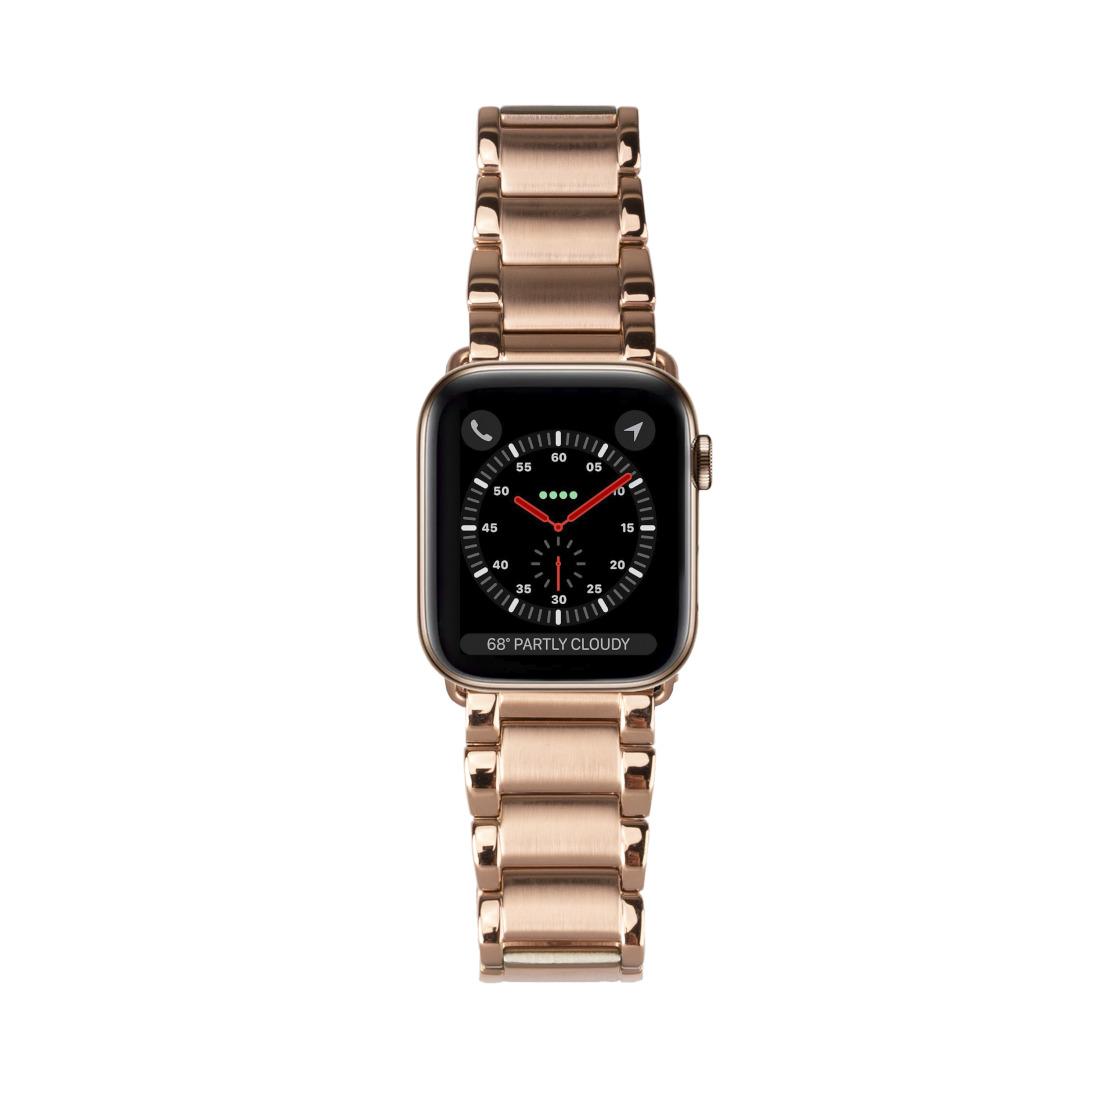 Apple Watch Band - Link Bracelet Band (42mm/44mm) - Gold